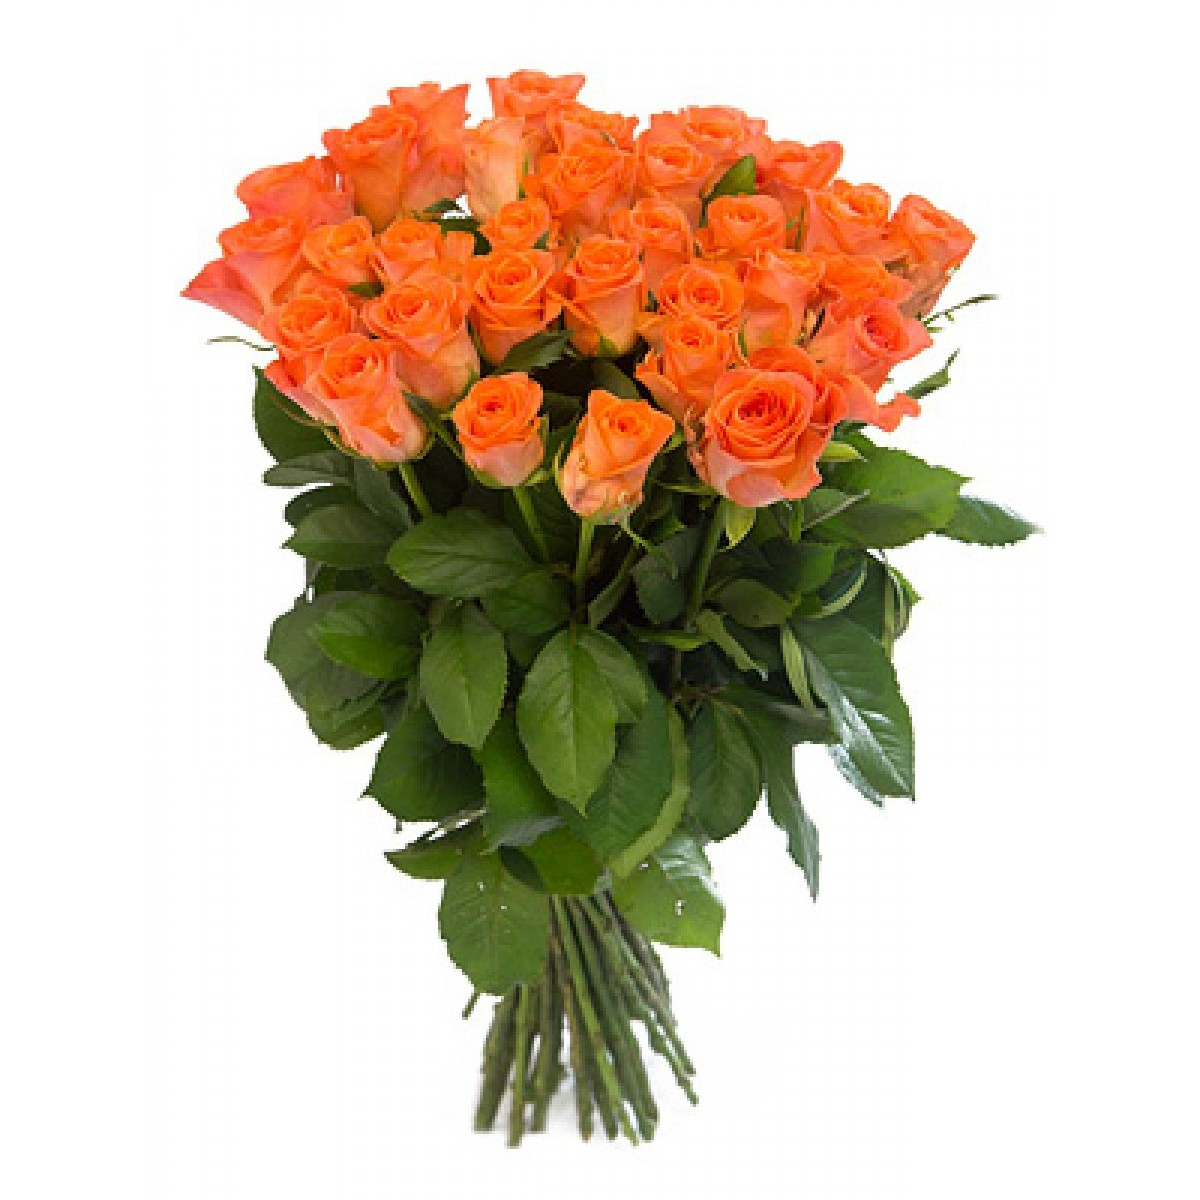 Букет от 15 до 25 оранжеви рози (ти избираш броя)